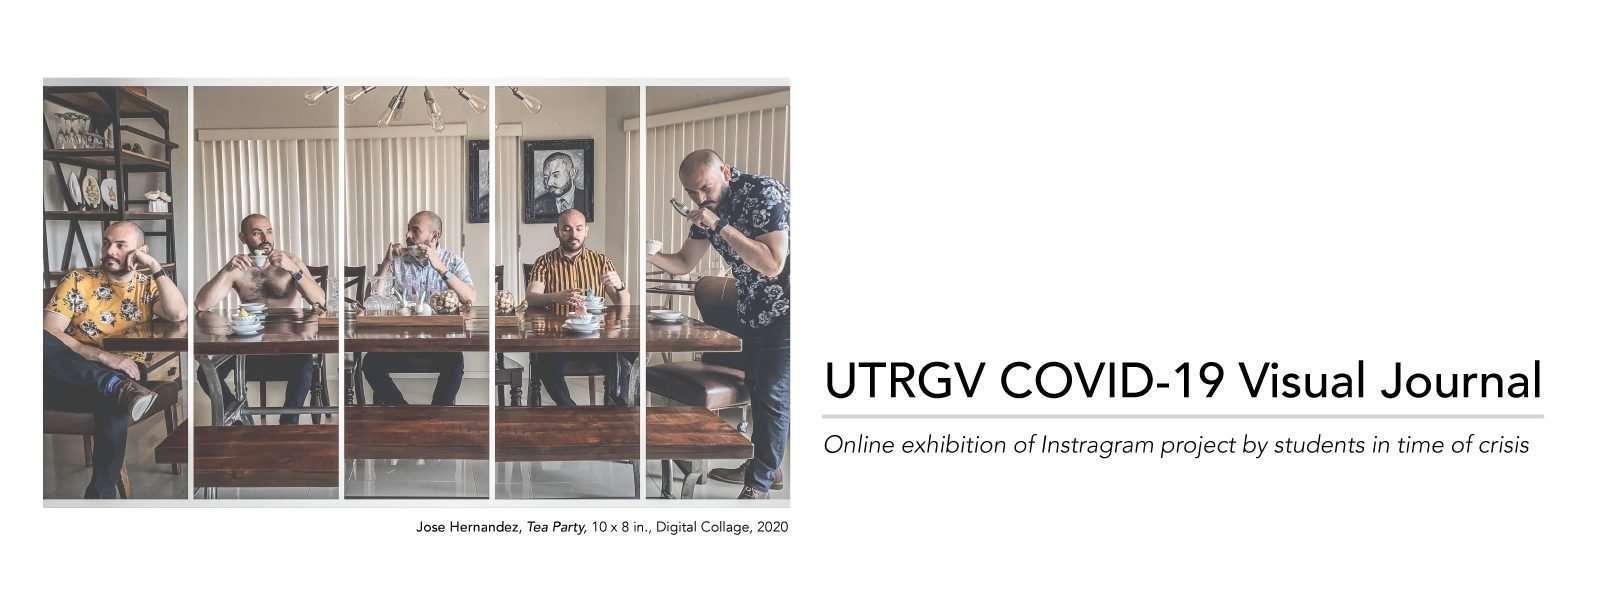 UTRGV Covid 19 Visual Journal